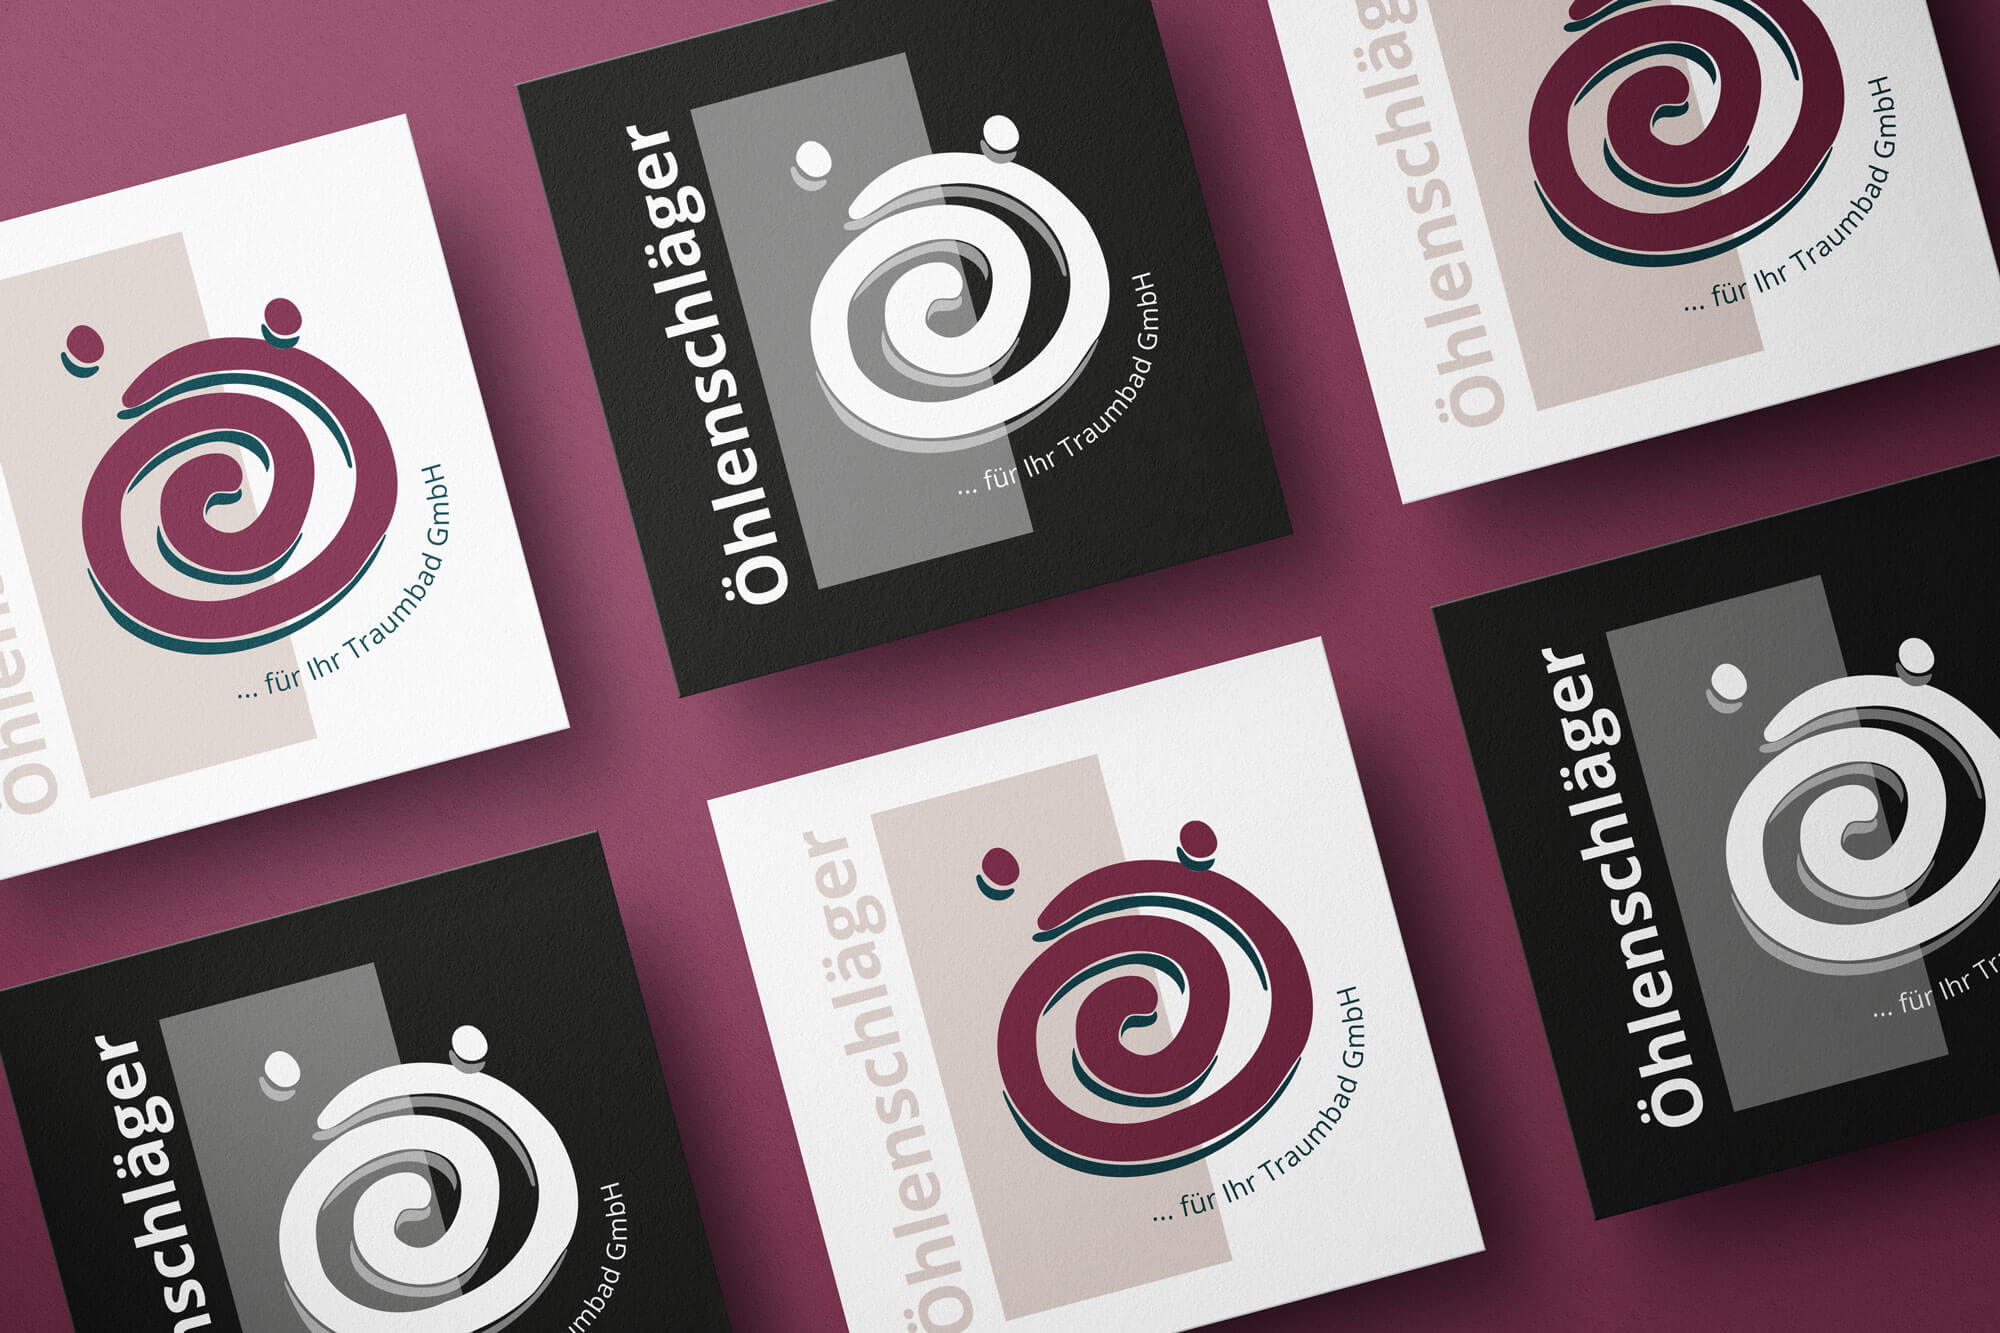 logo baederstudio oehlenschlaeger